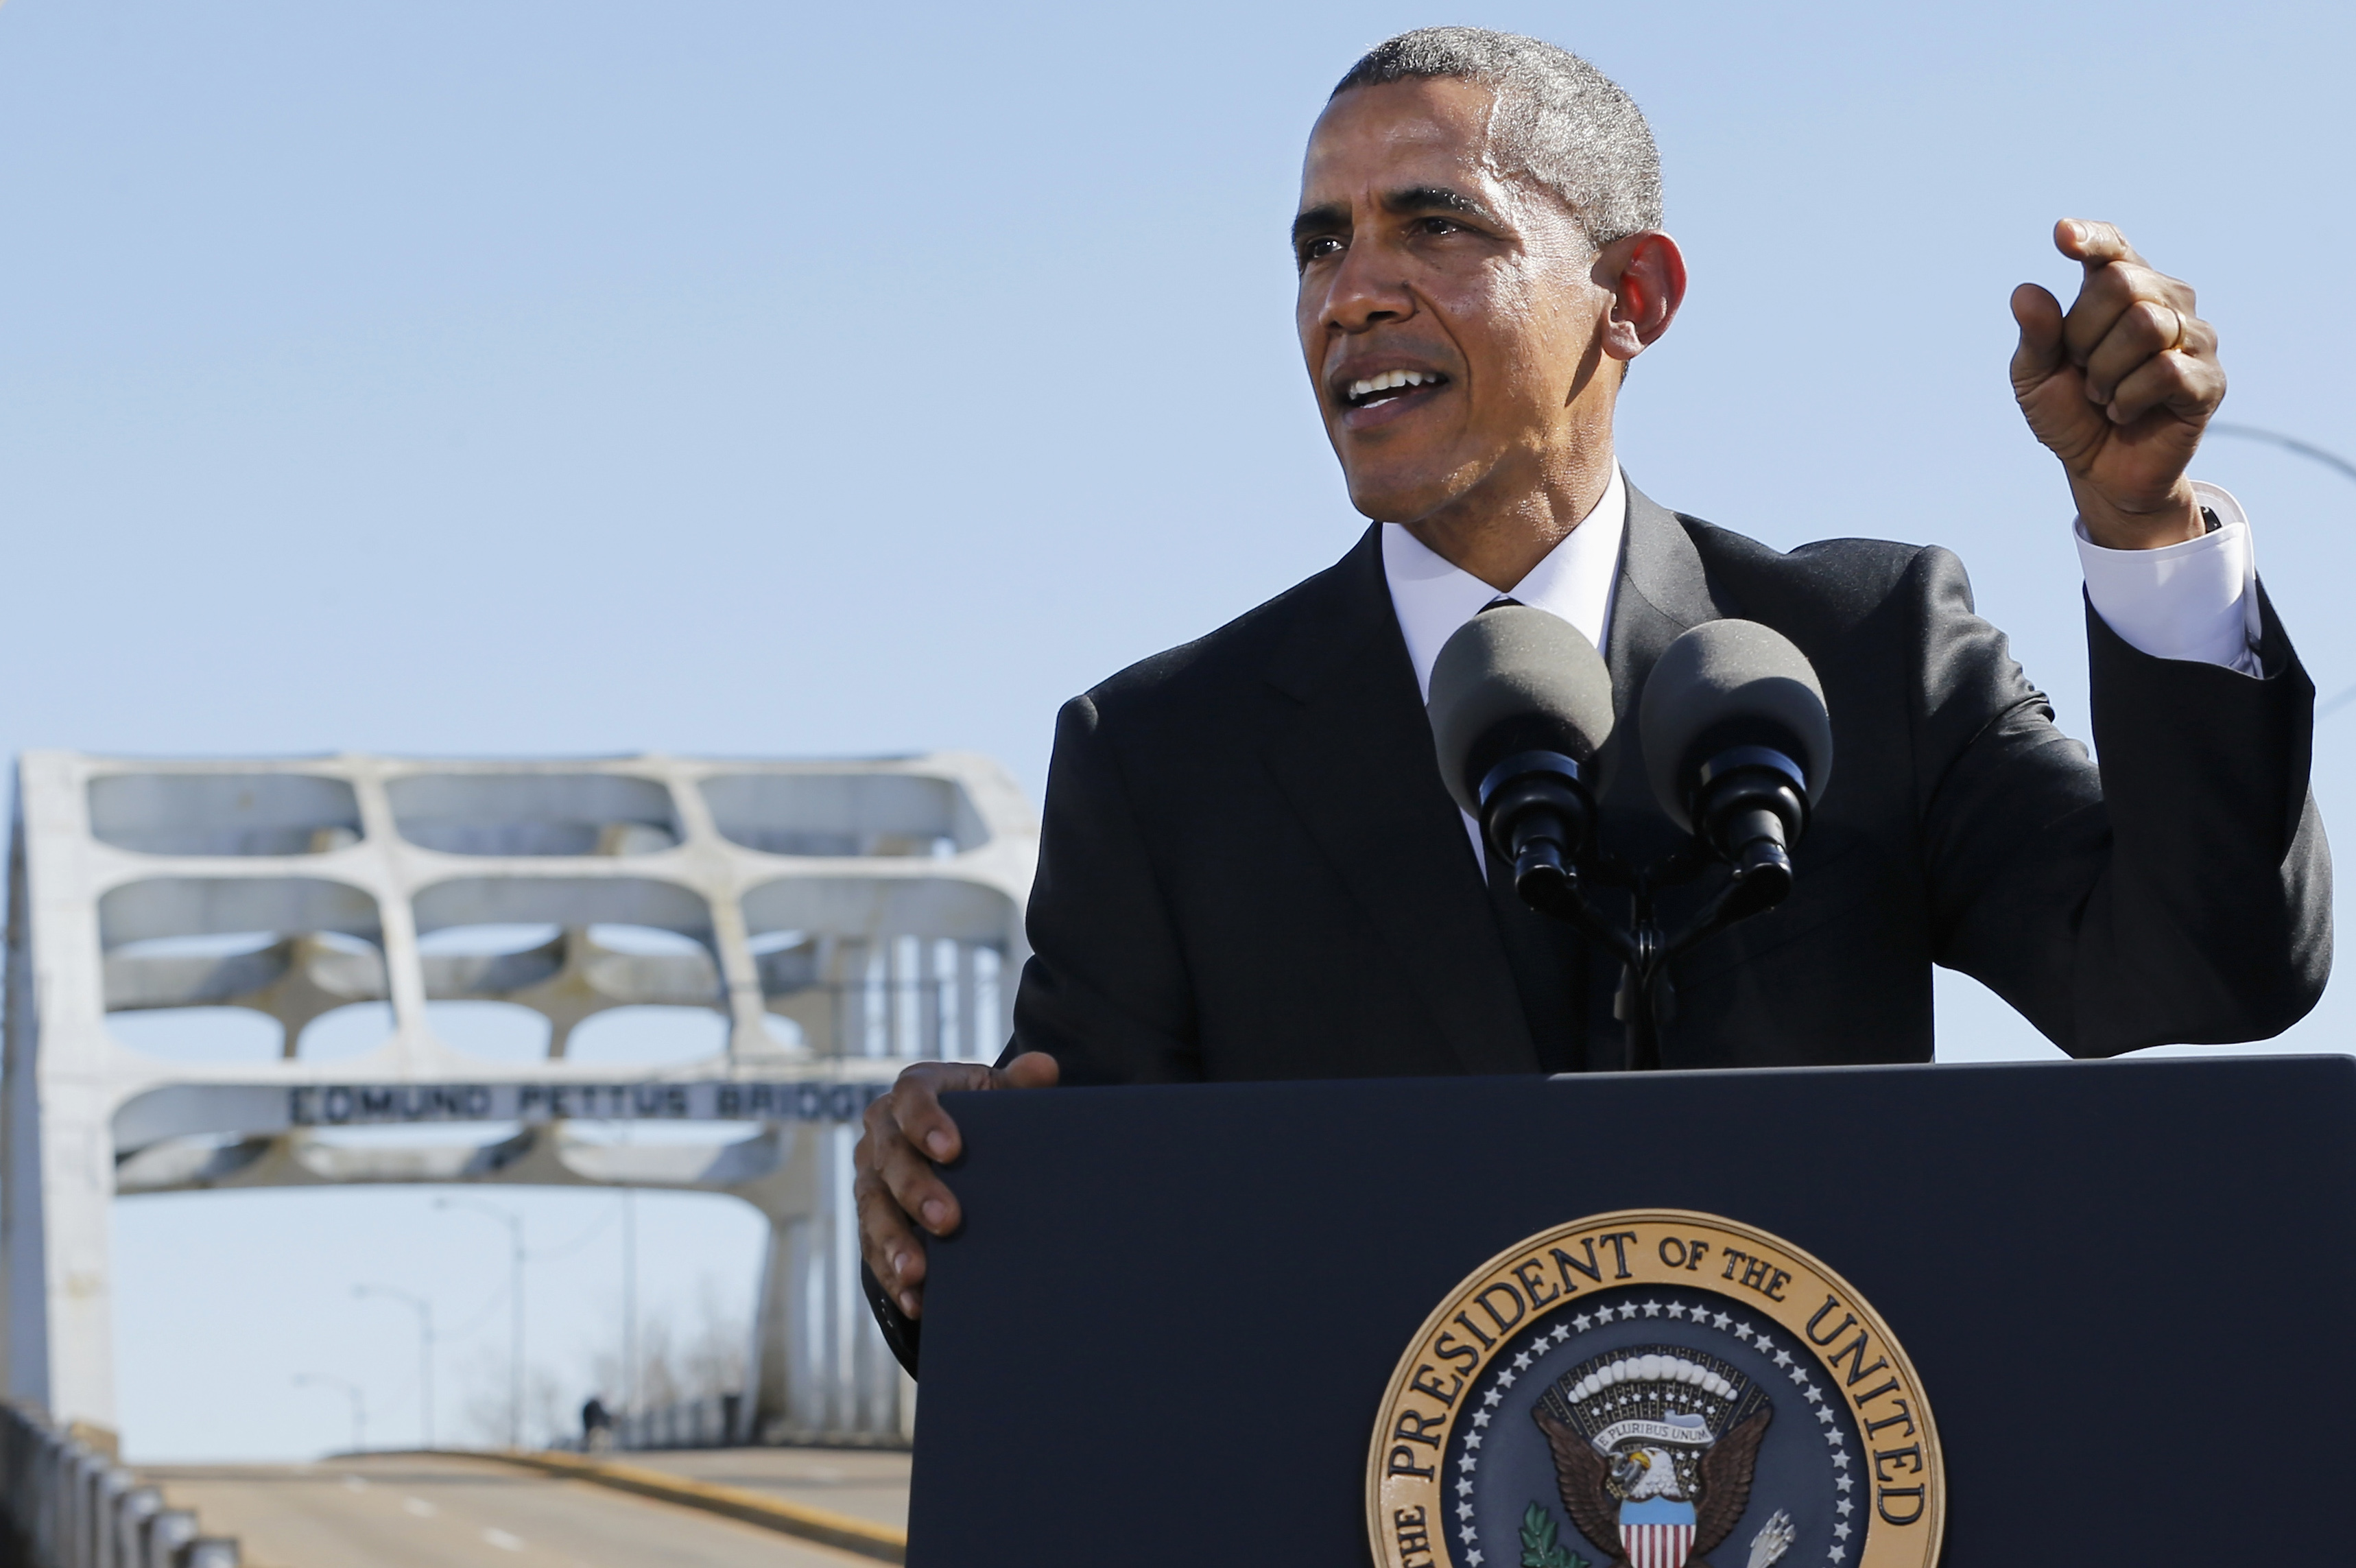 presidential speech essays